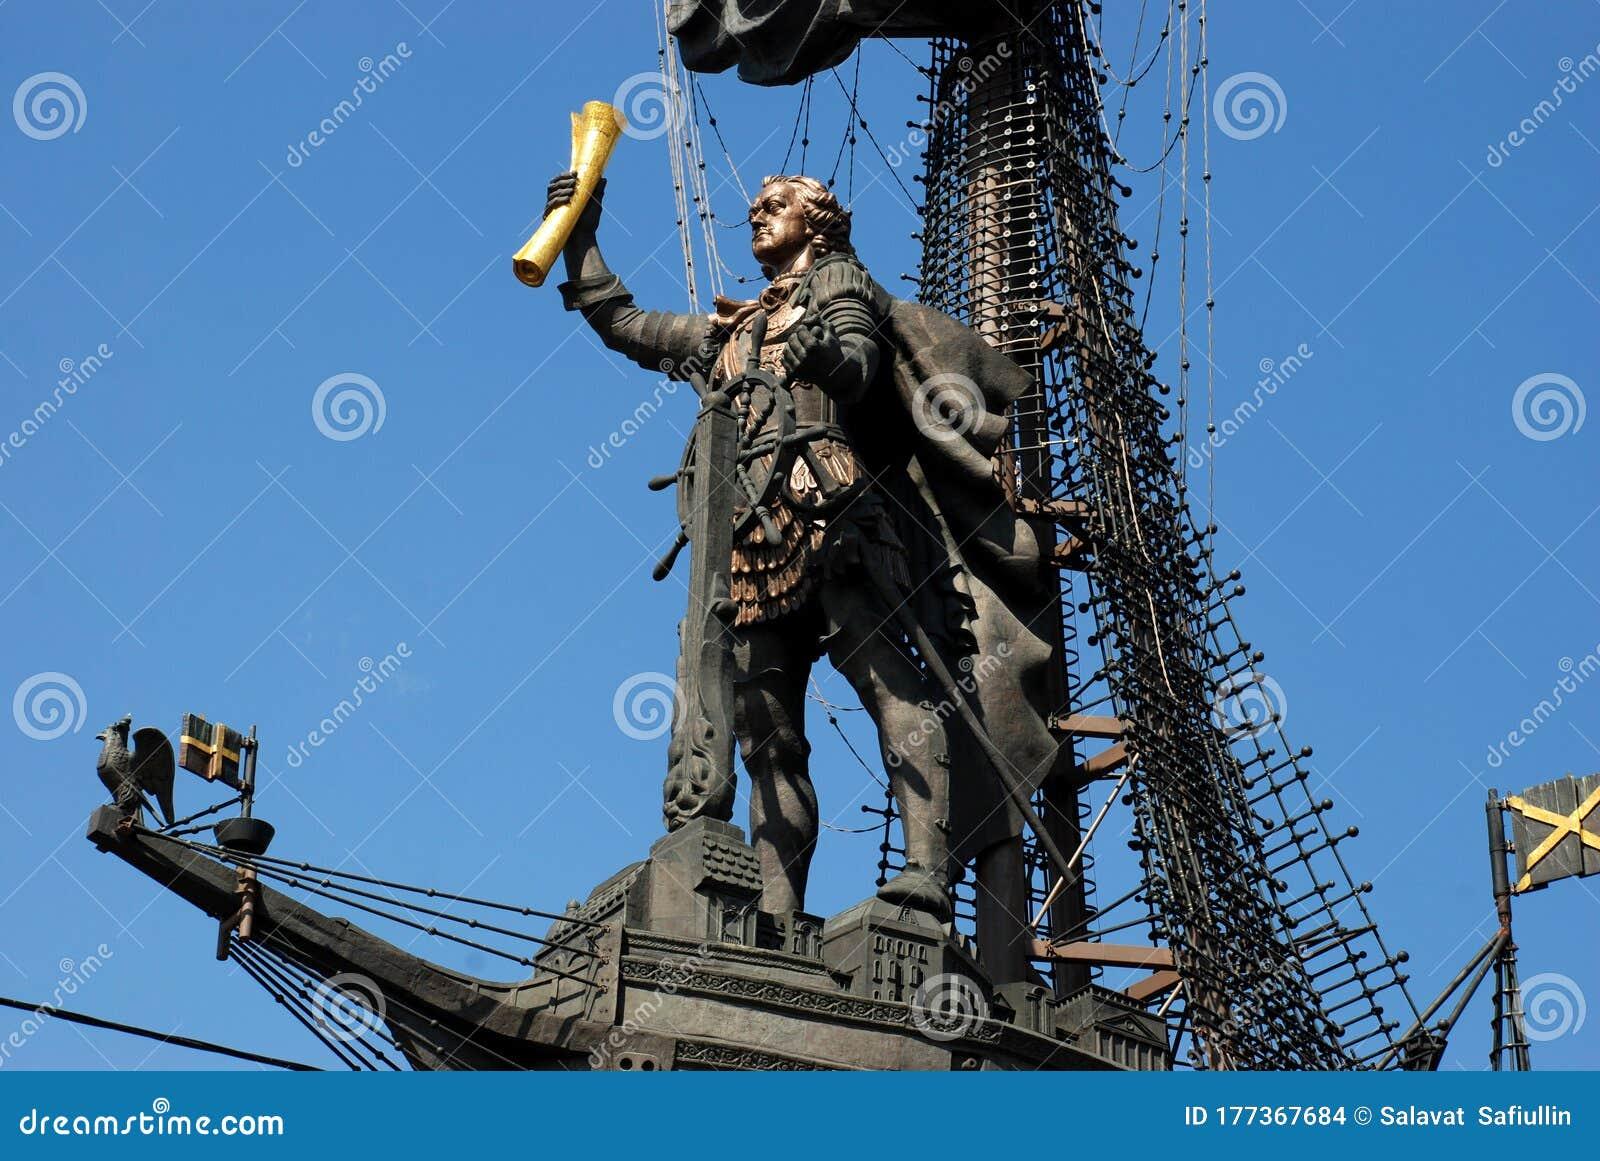 monumento a pedro el grande en moscu editorial stock image image of monumento moscumodernist 177367684